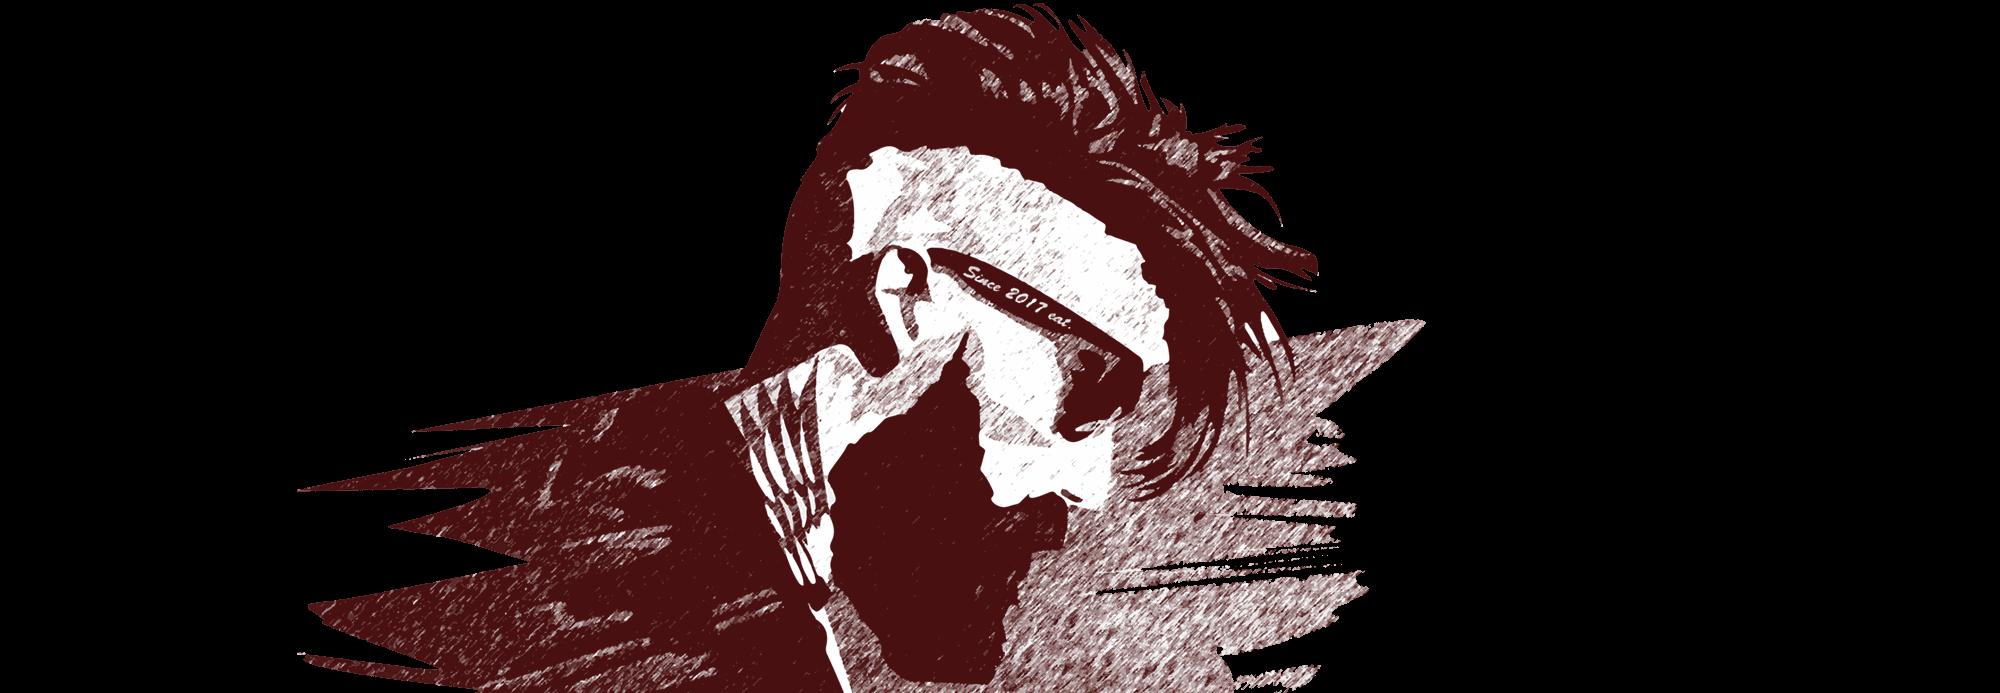 барбершоп headshot фоновый персонаж 12